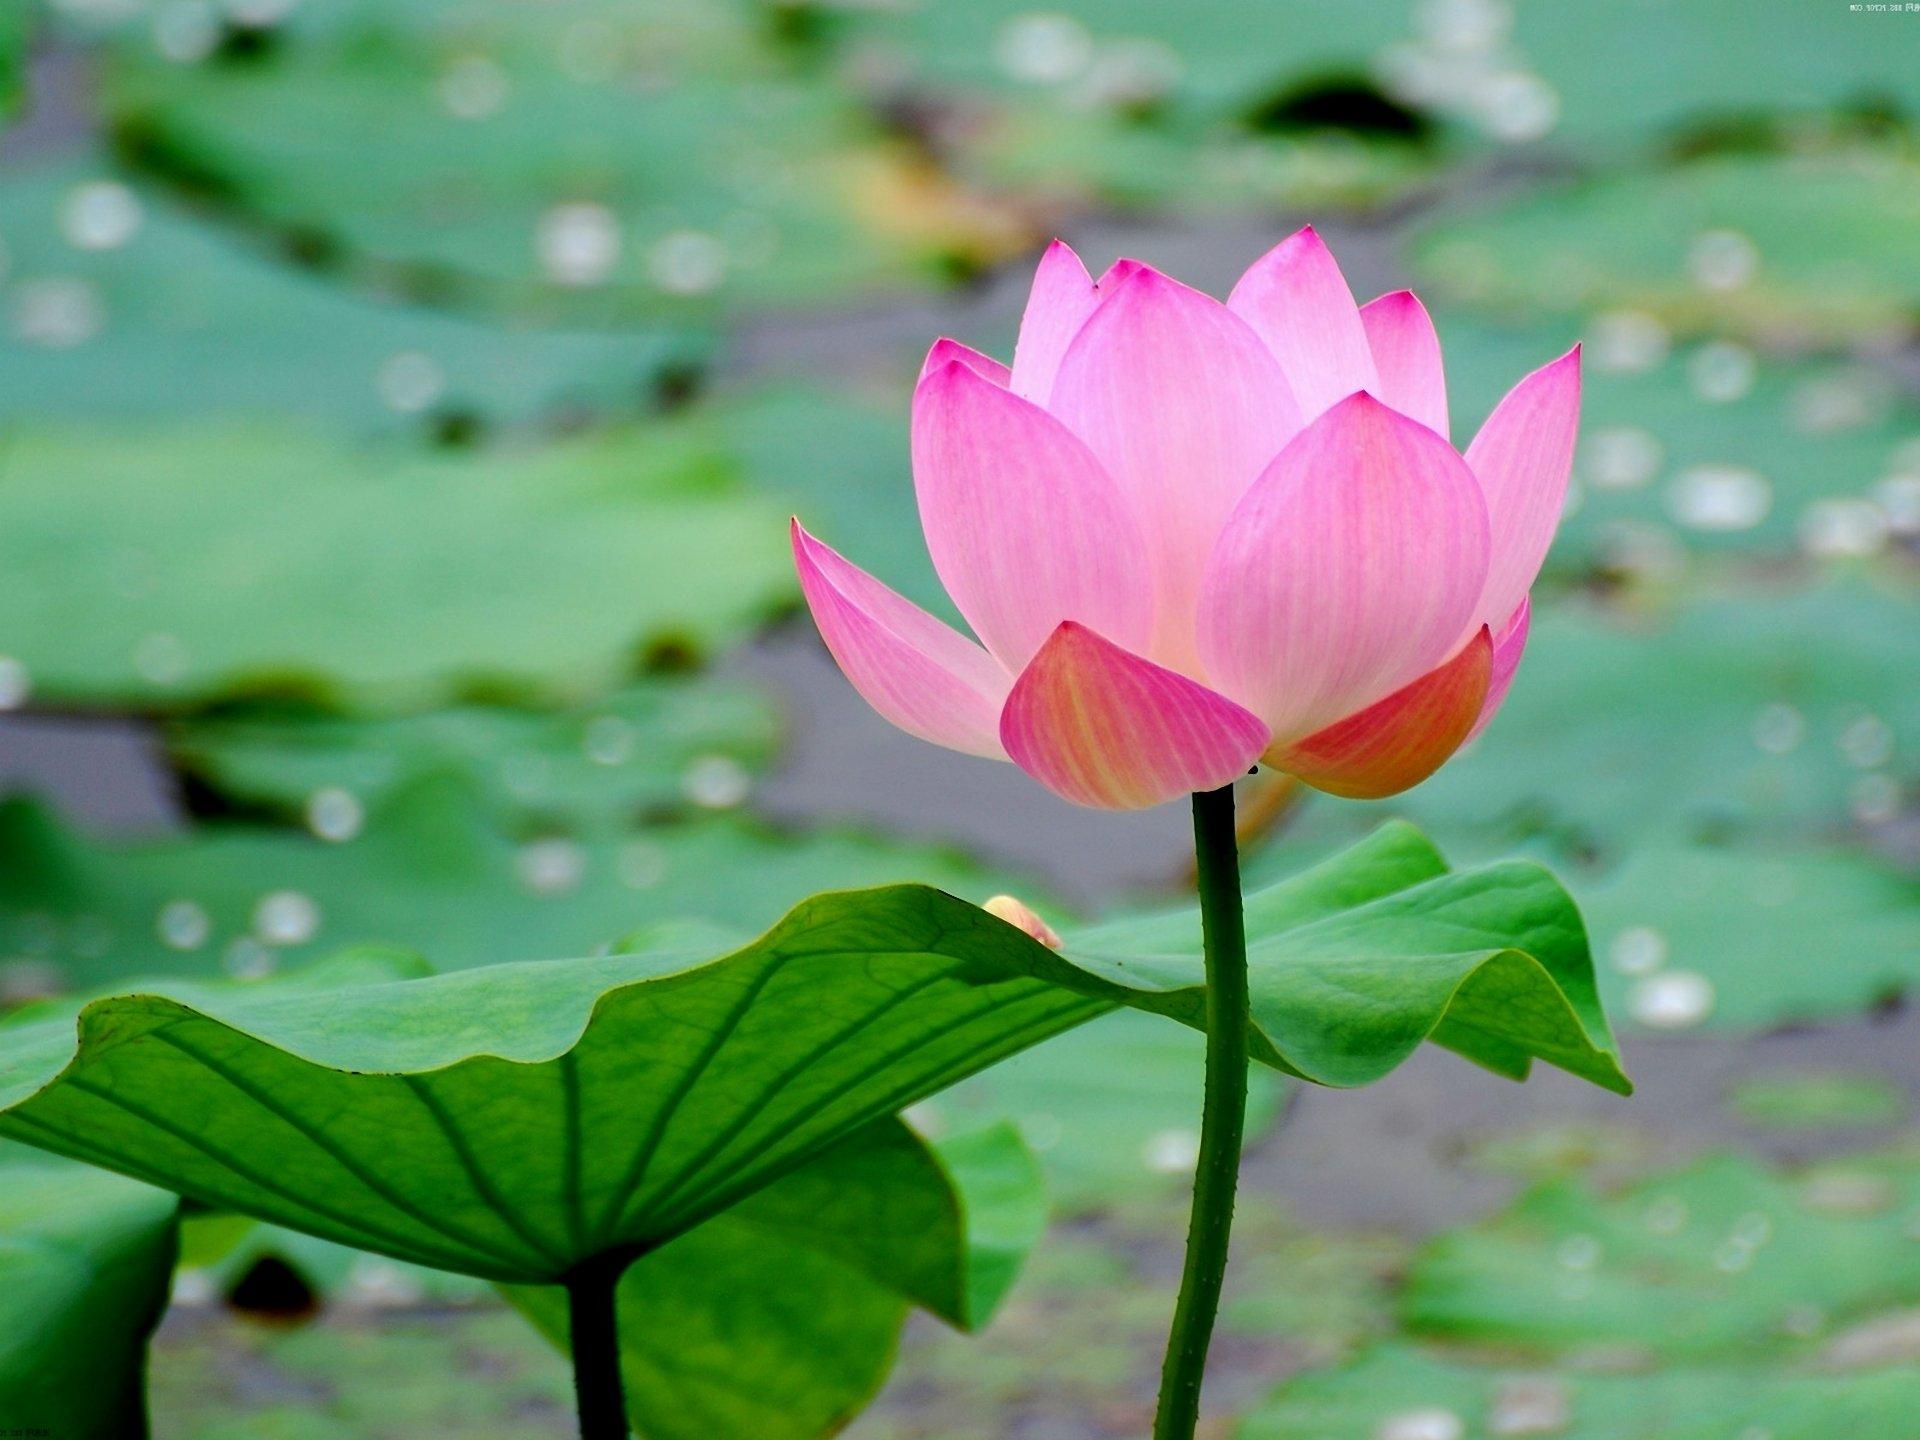 High Resolution Lotus Flower Hd 1920x1440 Wallpaper Id48392 For Desktop